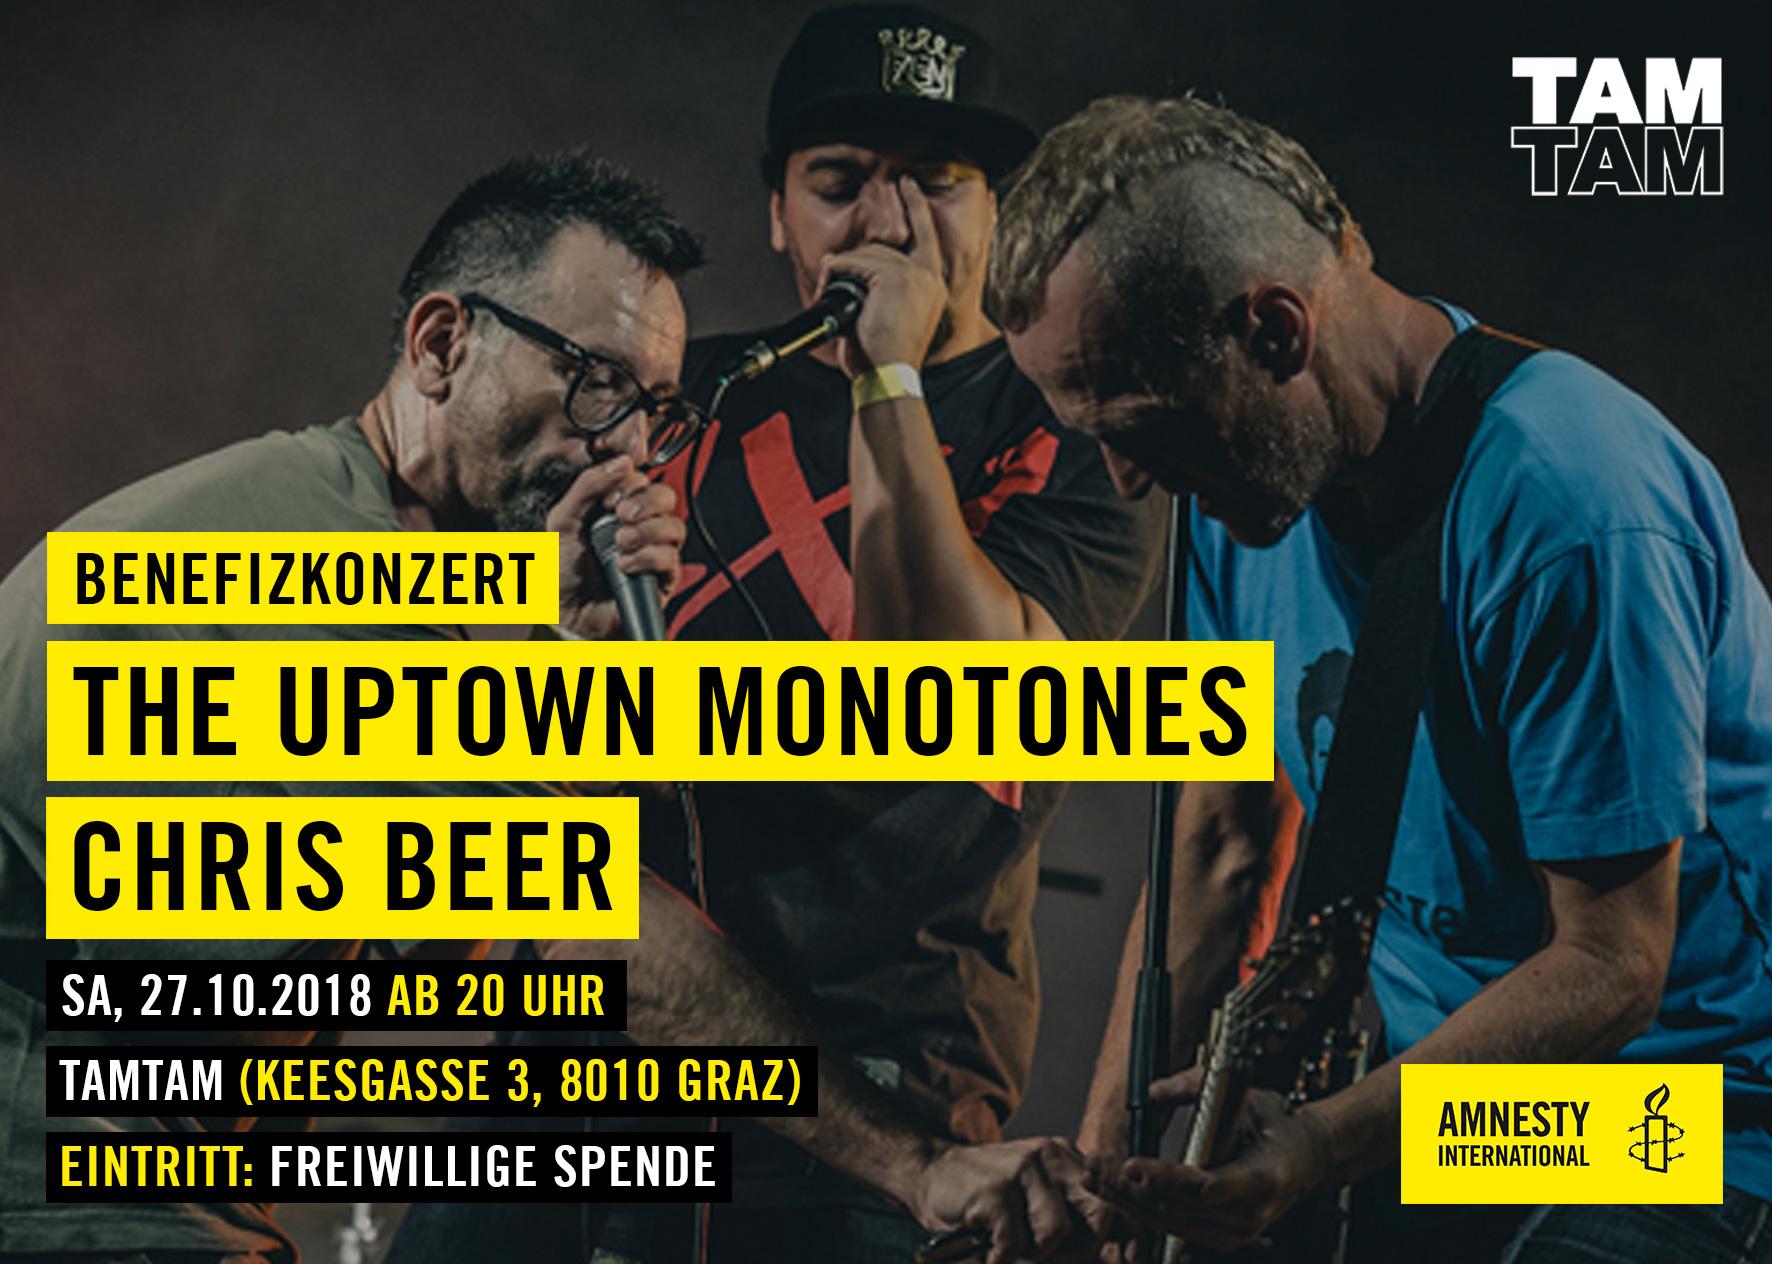 AI-TUM-Flyer-The-Uptown-Monotones | © Amnesty Gruppe Graz